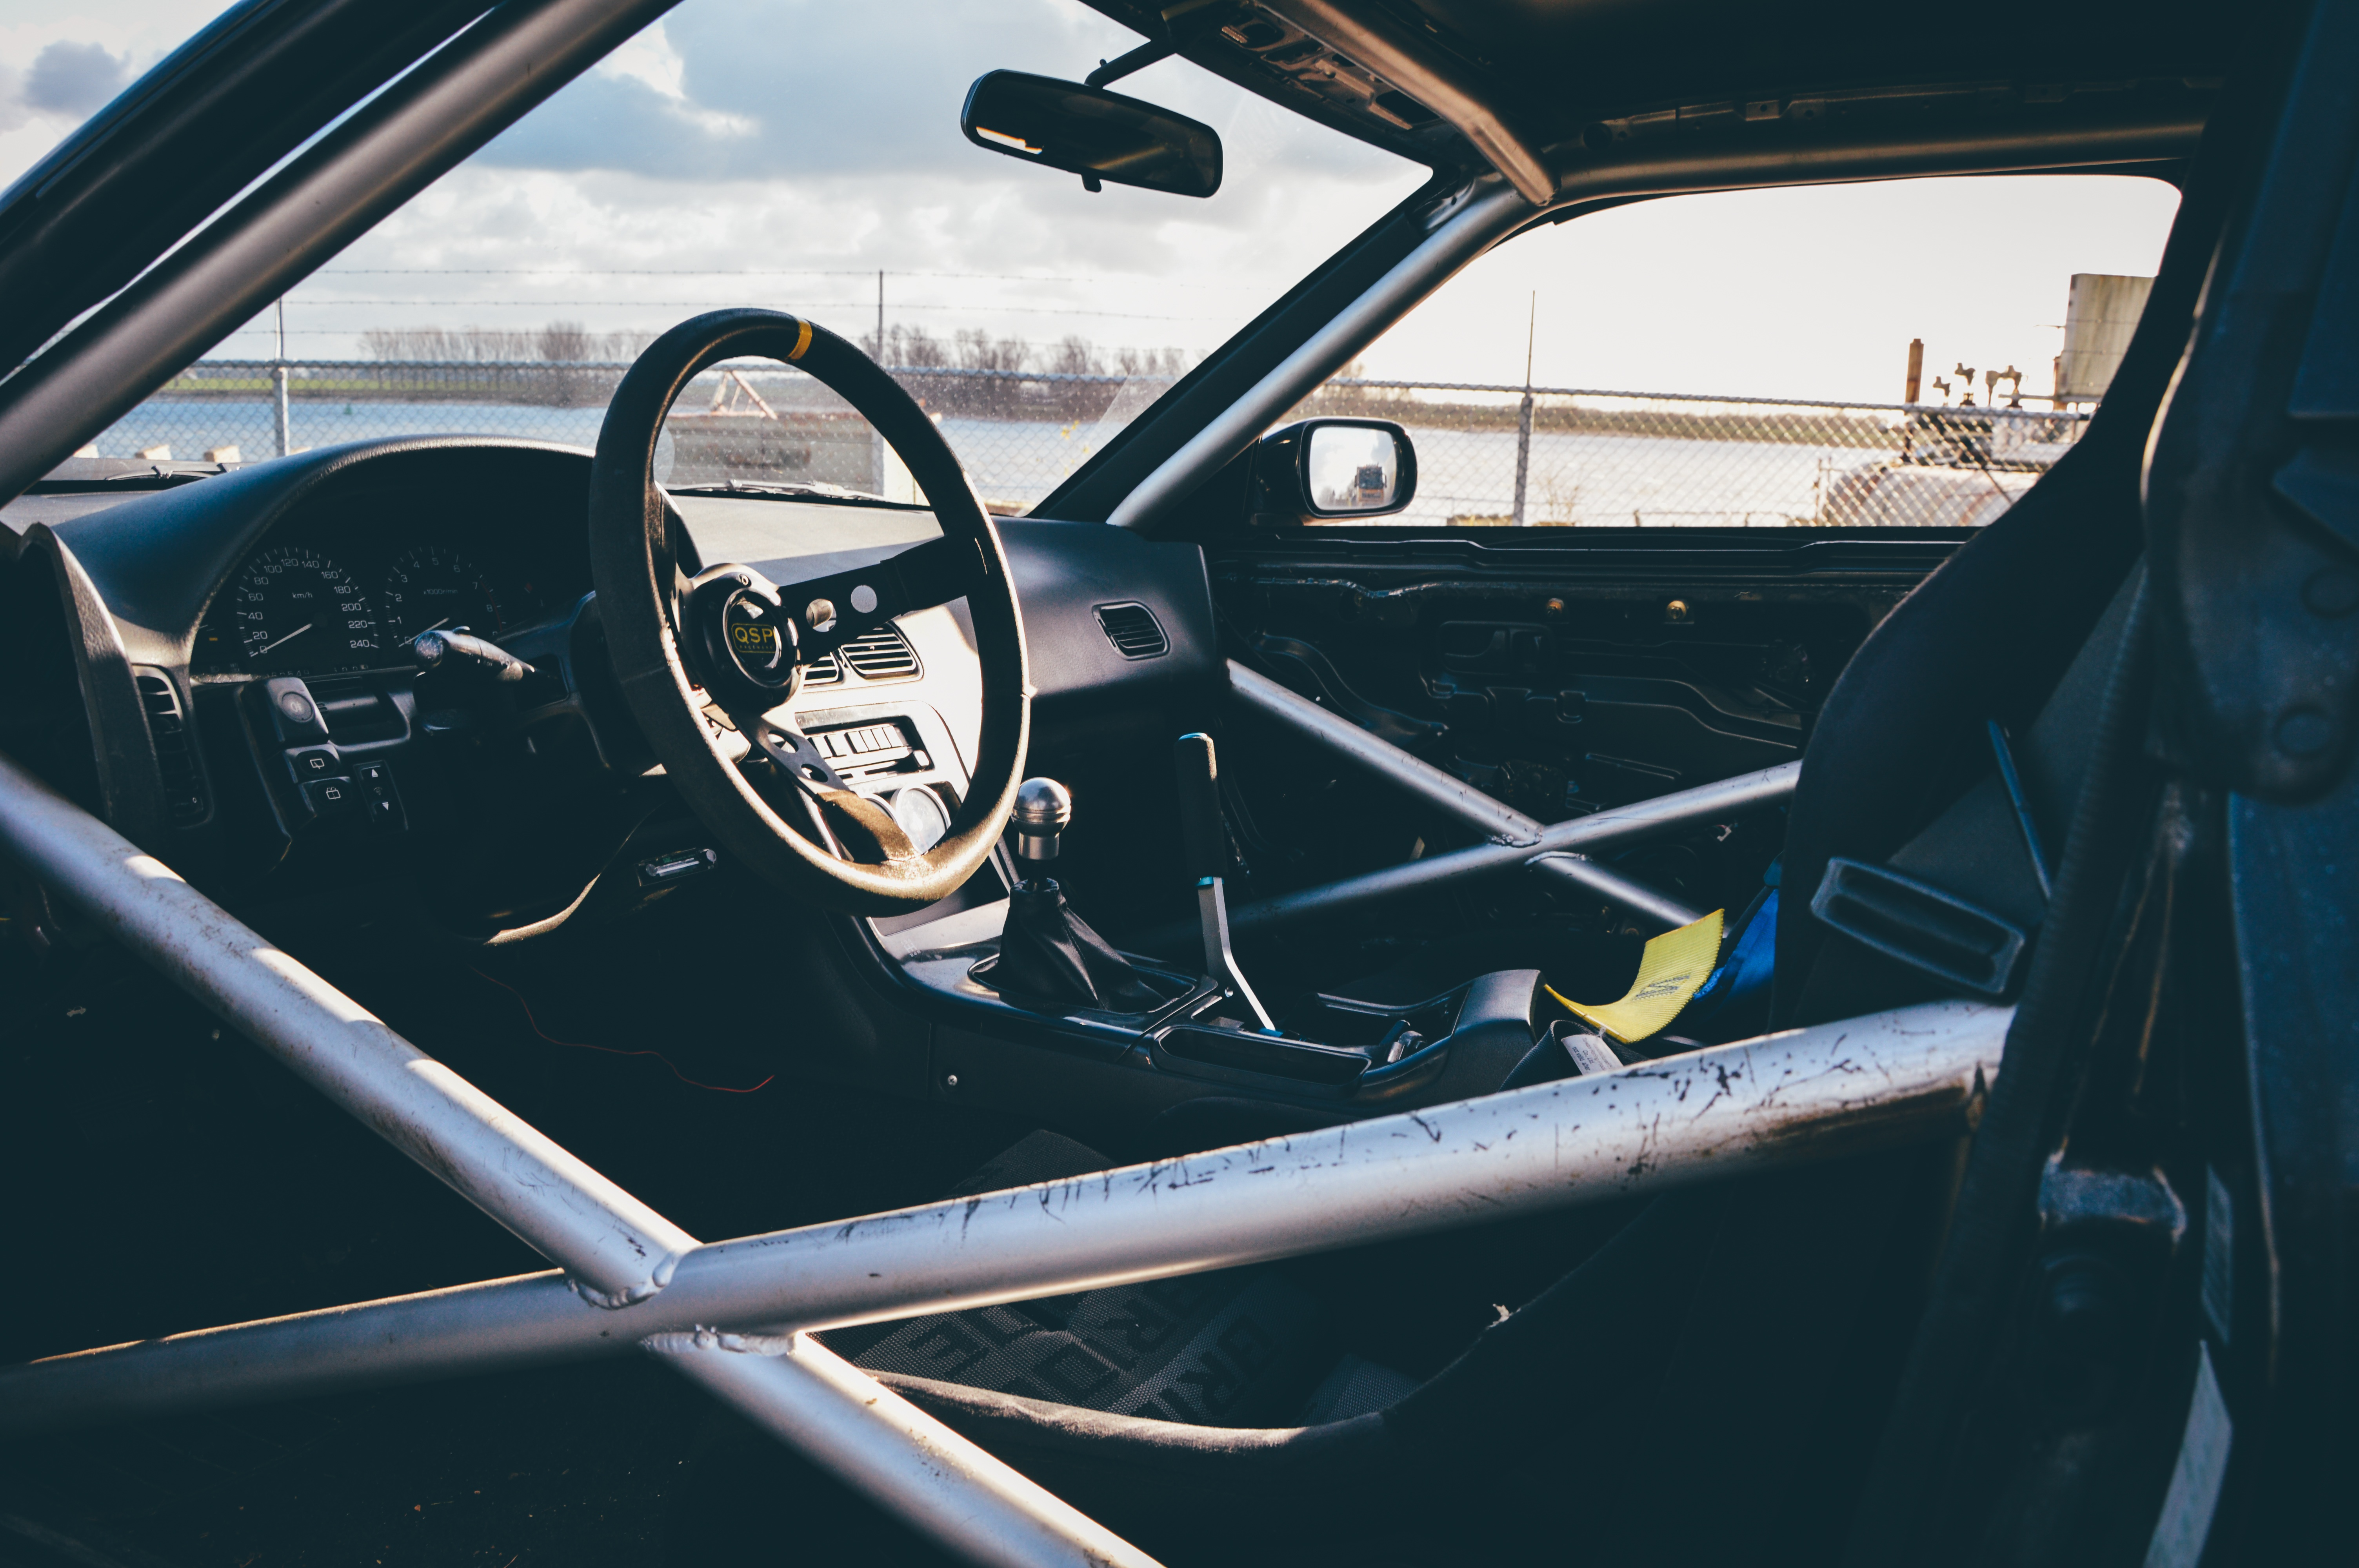 Race Car Interior, Car, Control, Luxury, Race, HQ Photo